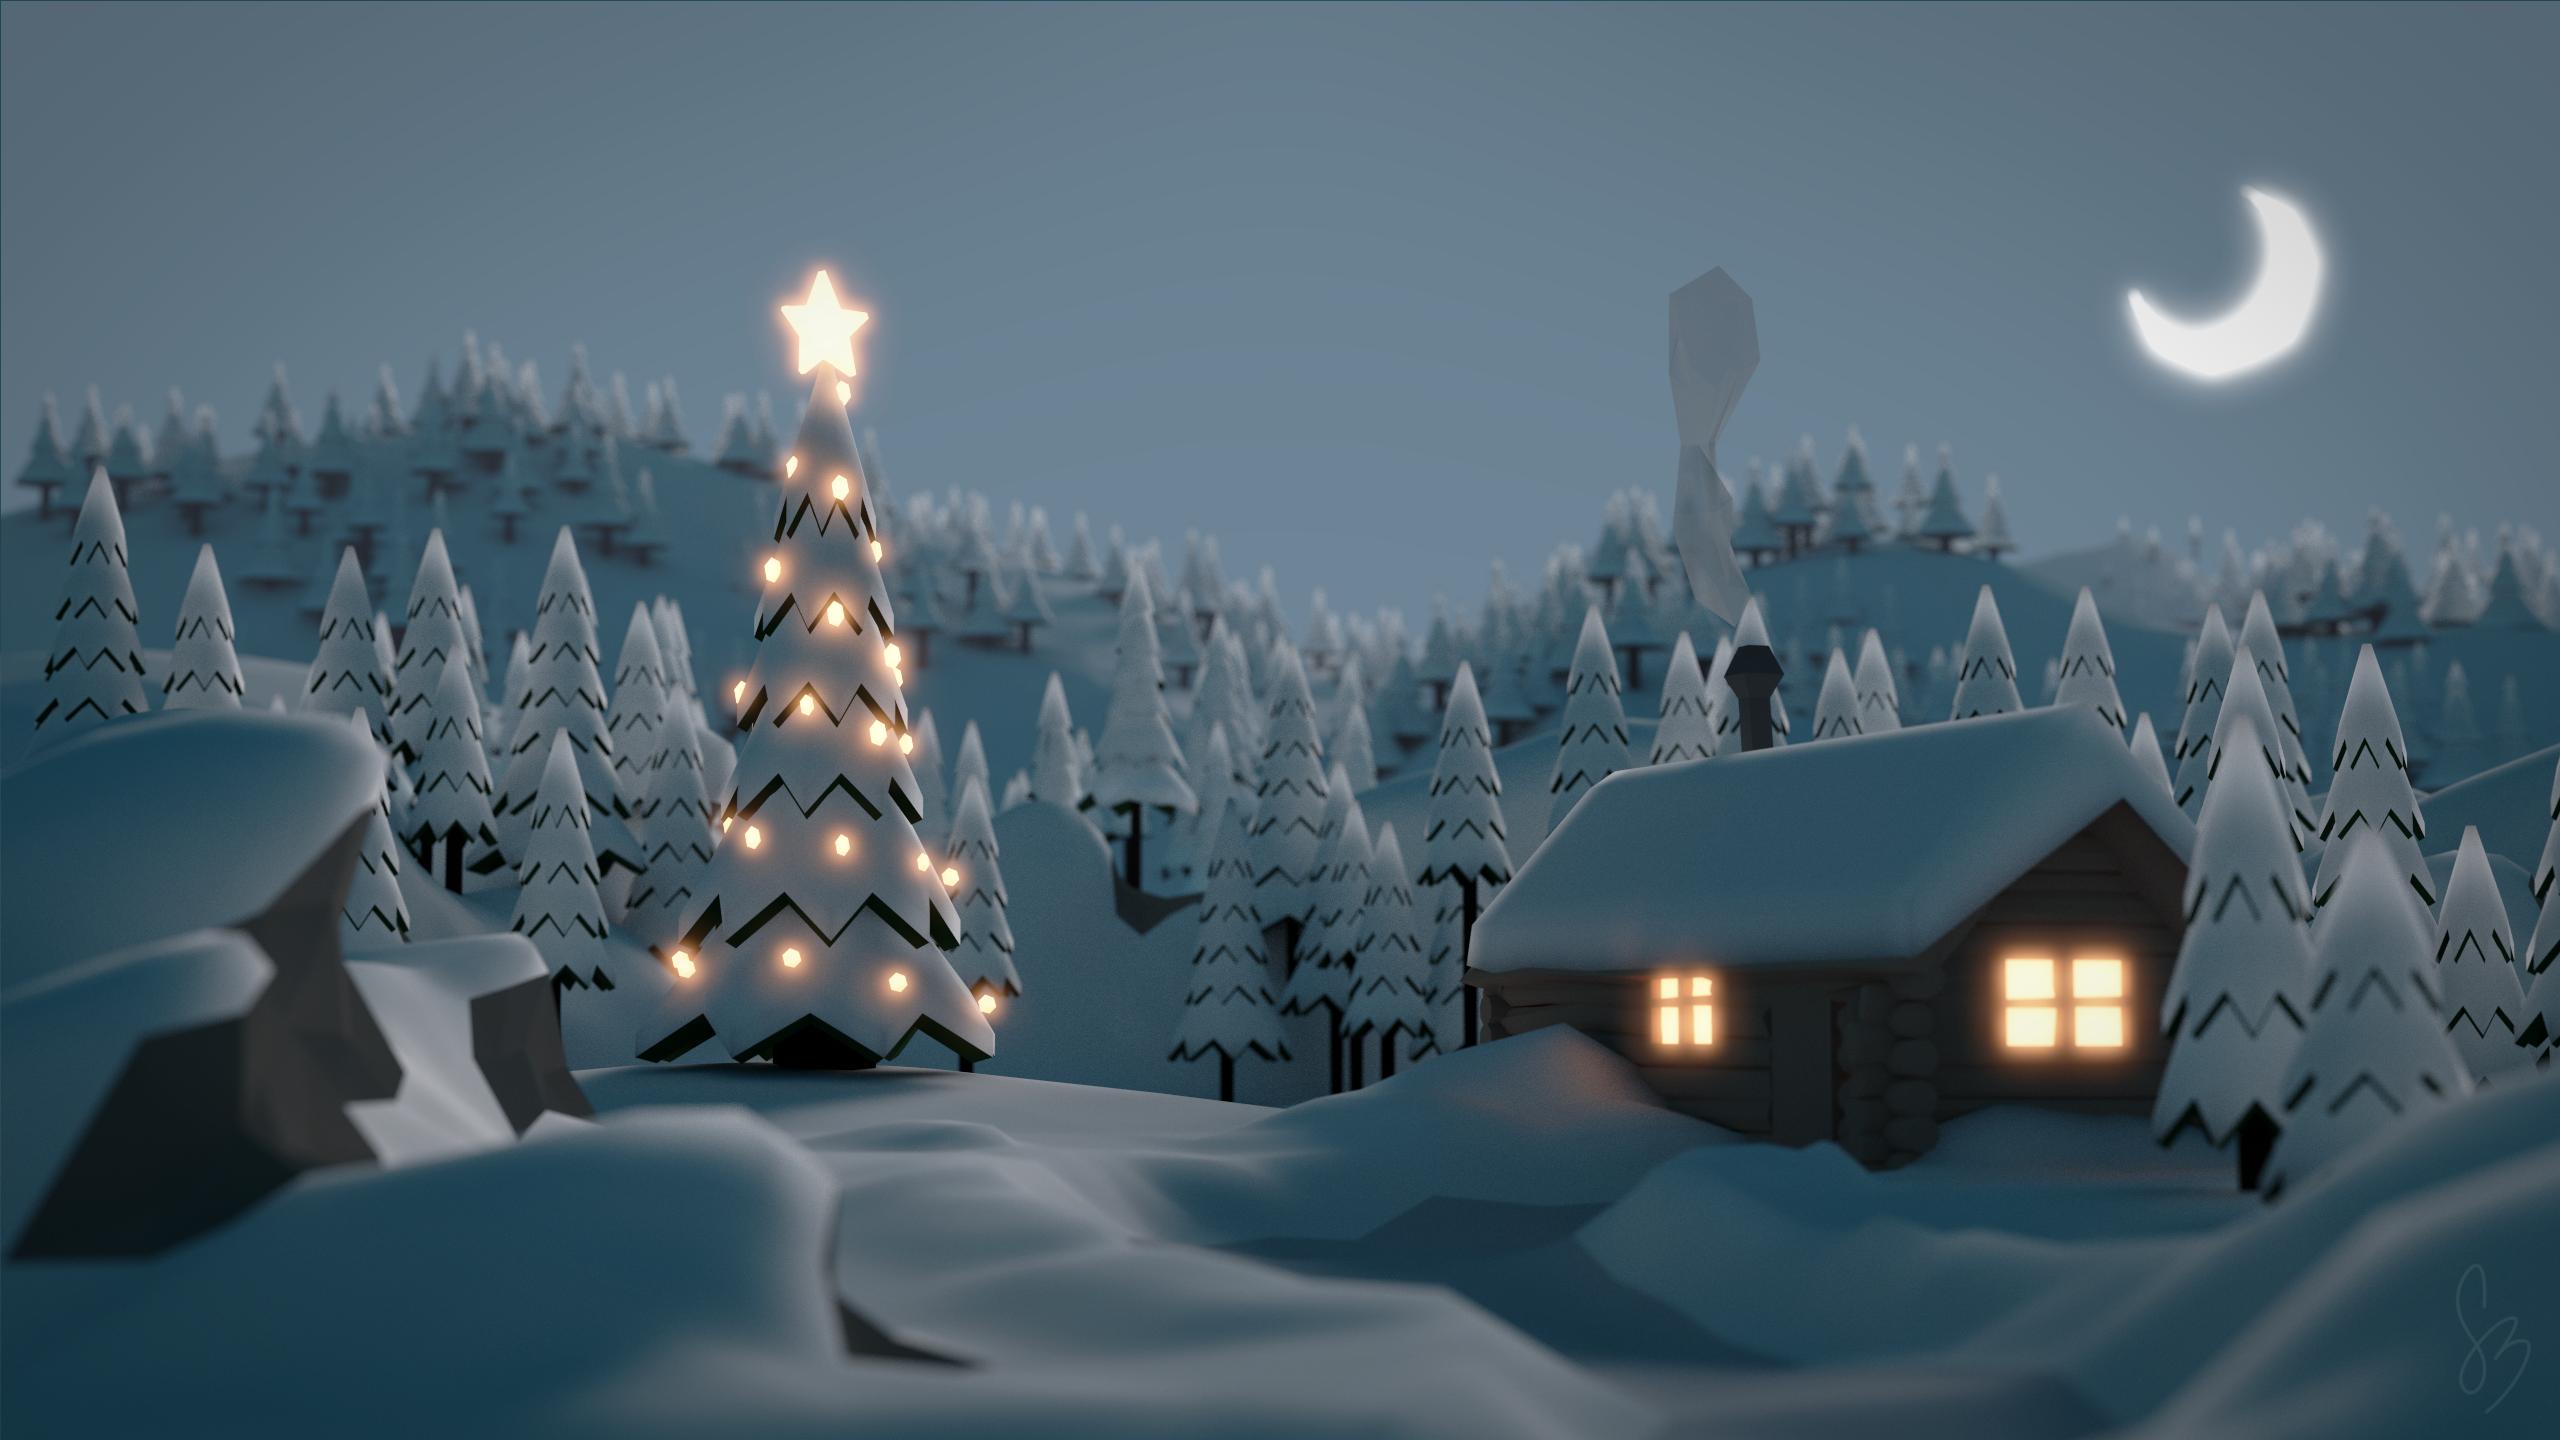 Winter Wallpaper HD Download 2560x1440